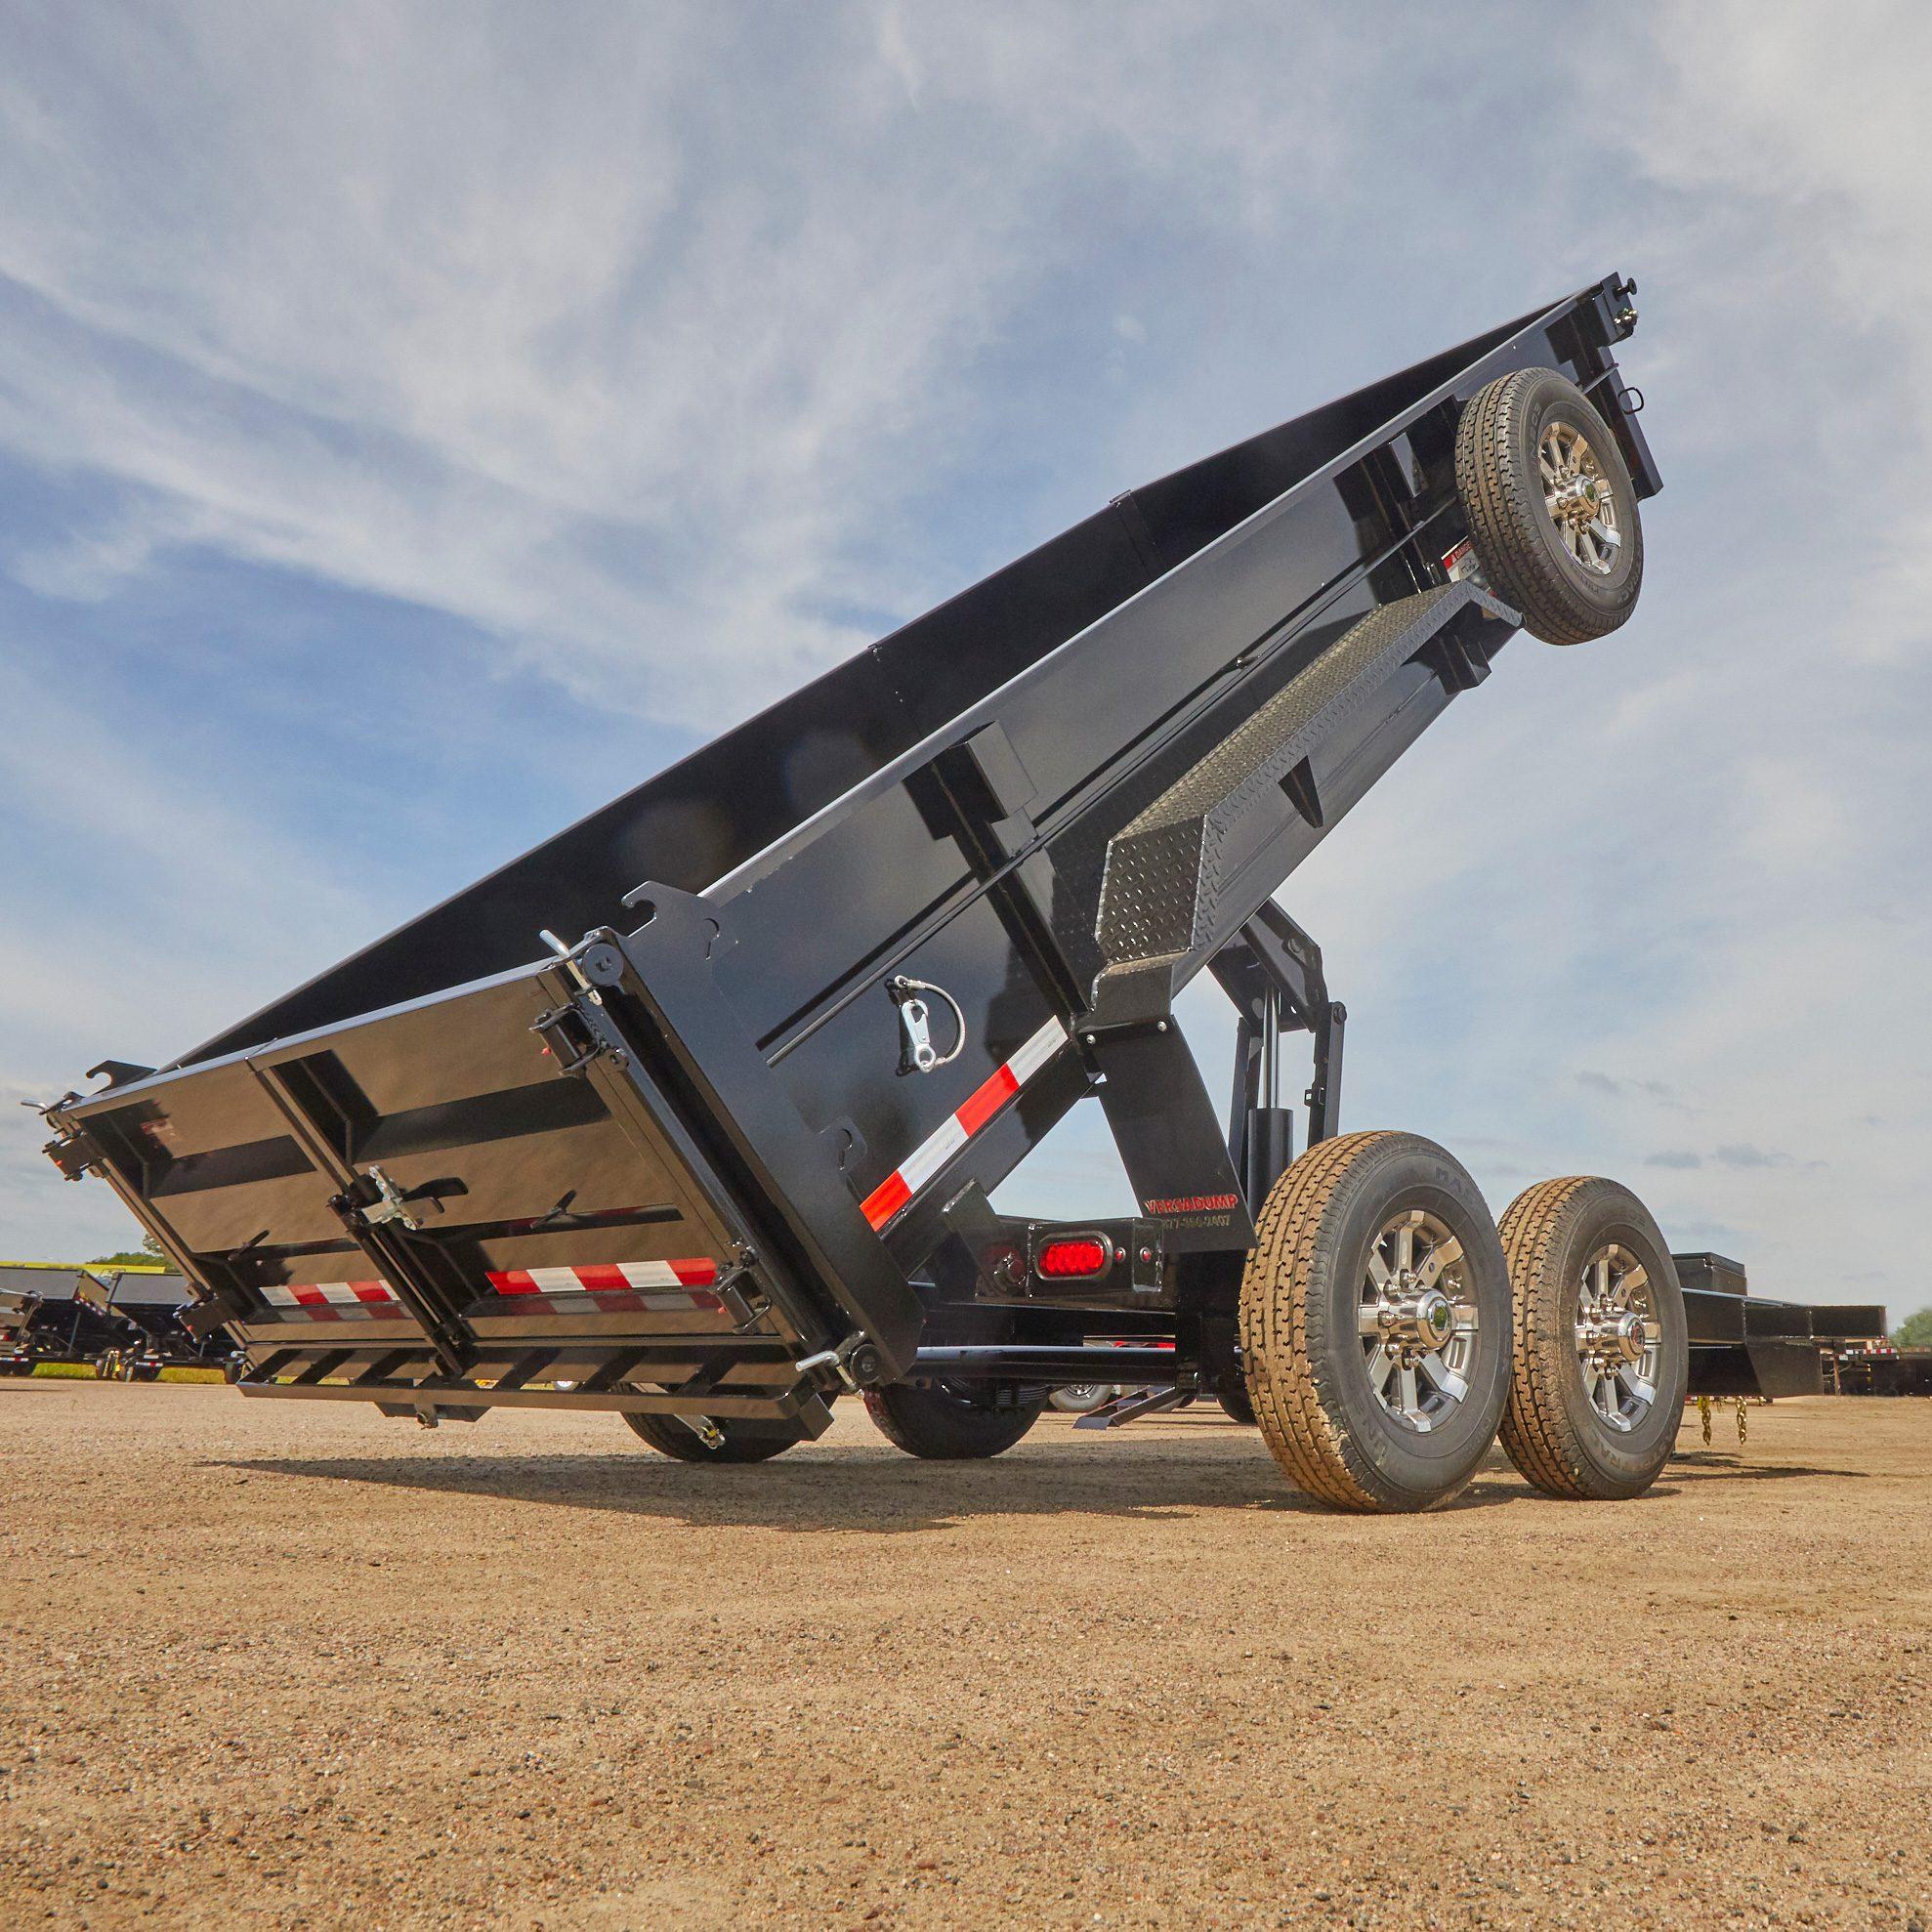 Black Dump Trailer in Dump Position | Construction Pro Tips